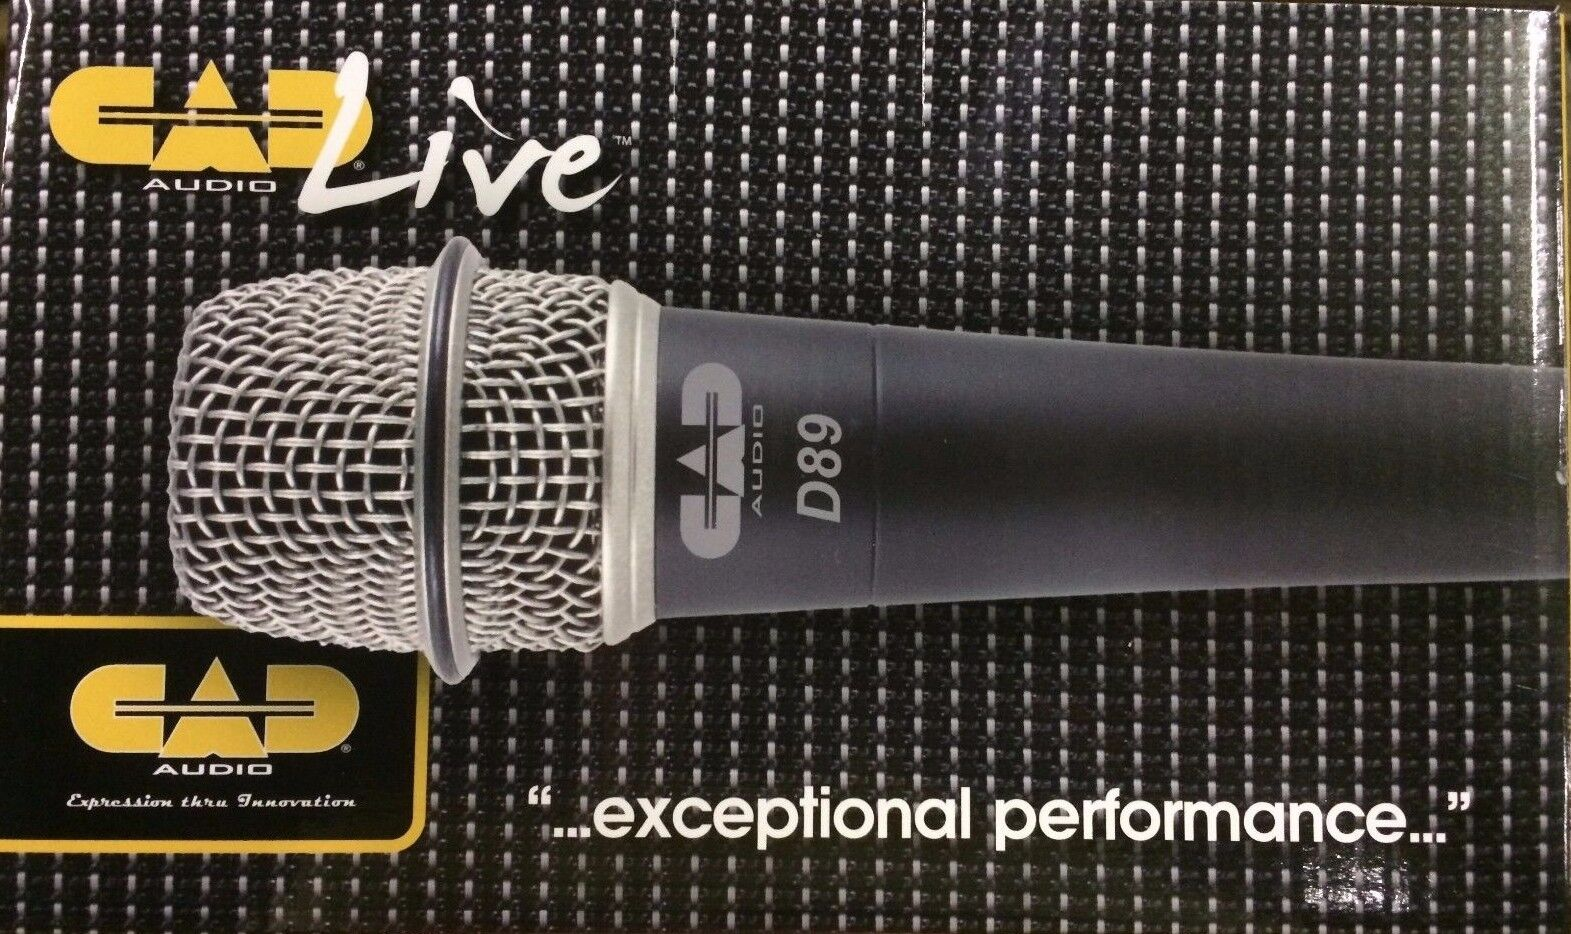 Cad - D89 - - - Premium Supercardioide Dinámico Instrumento Micrófono a5aac4